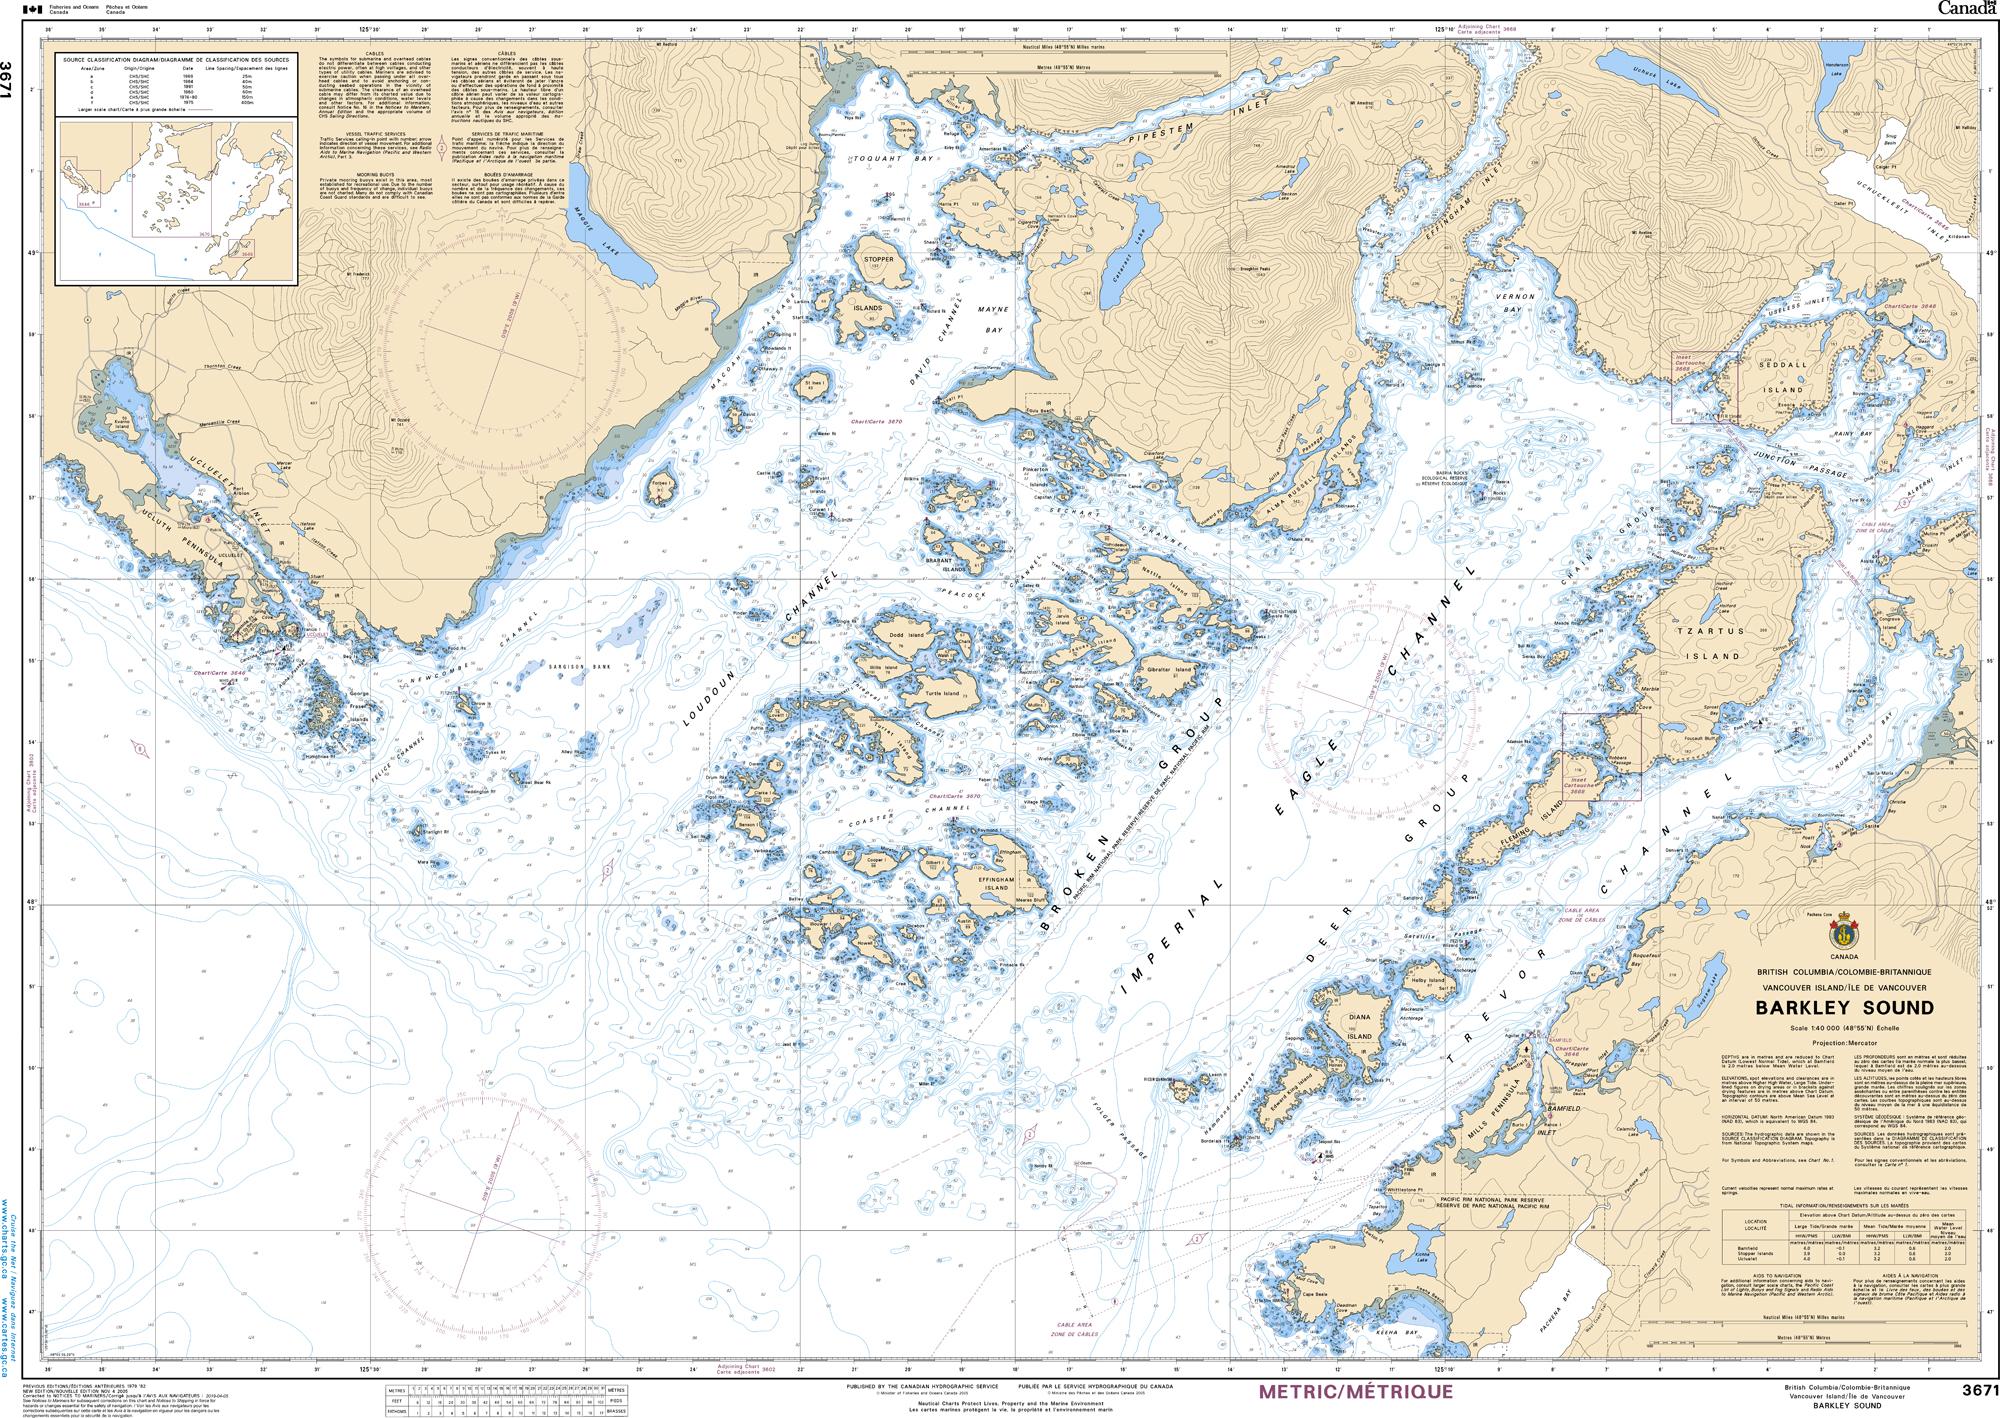 Pacific Region, CHS Chart 3671: Barkley Sound